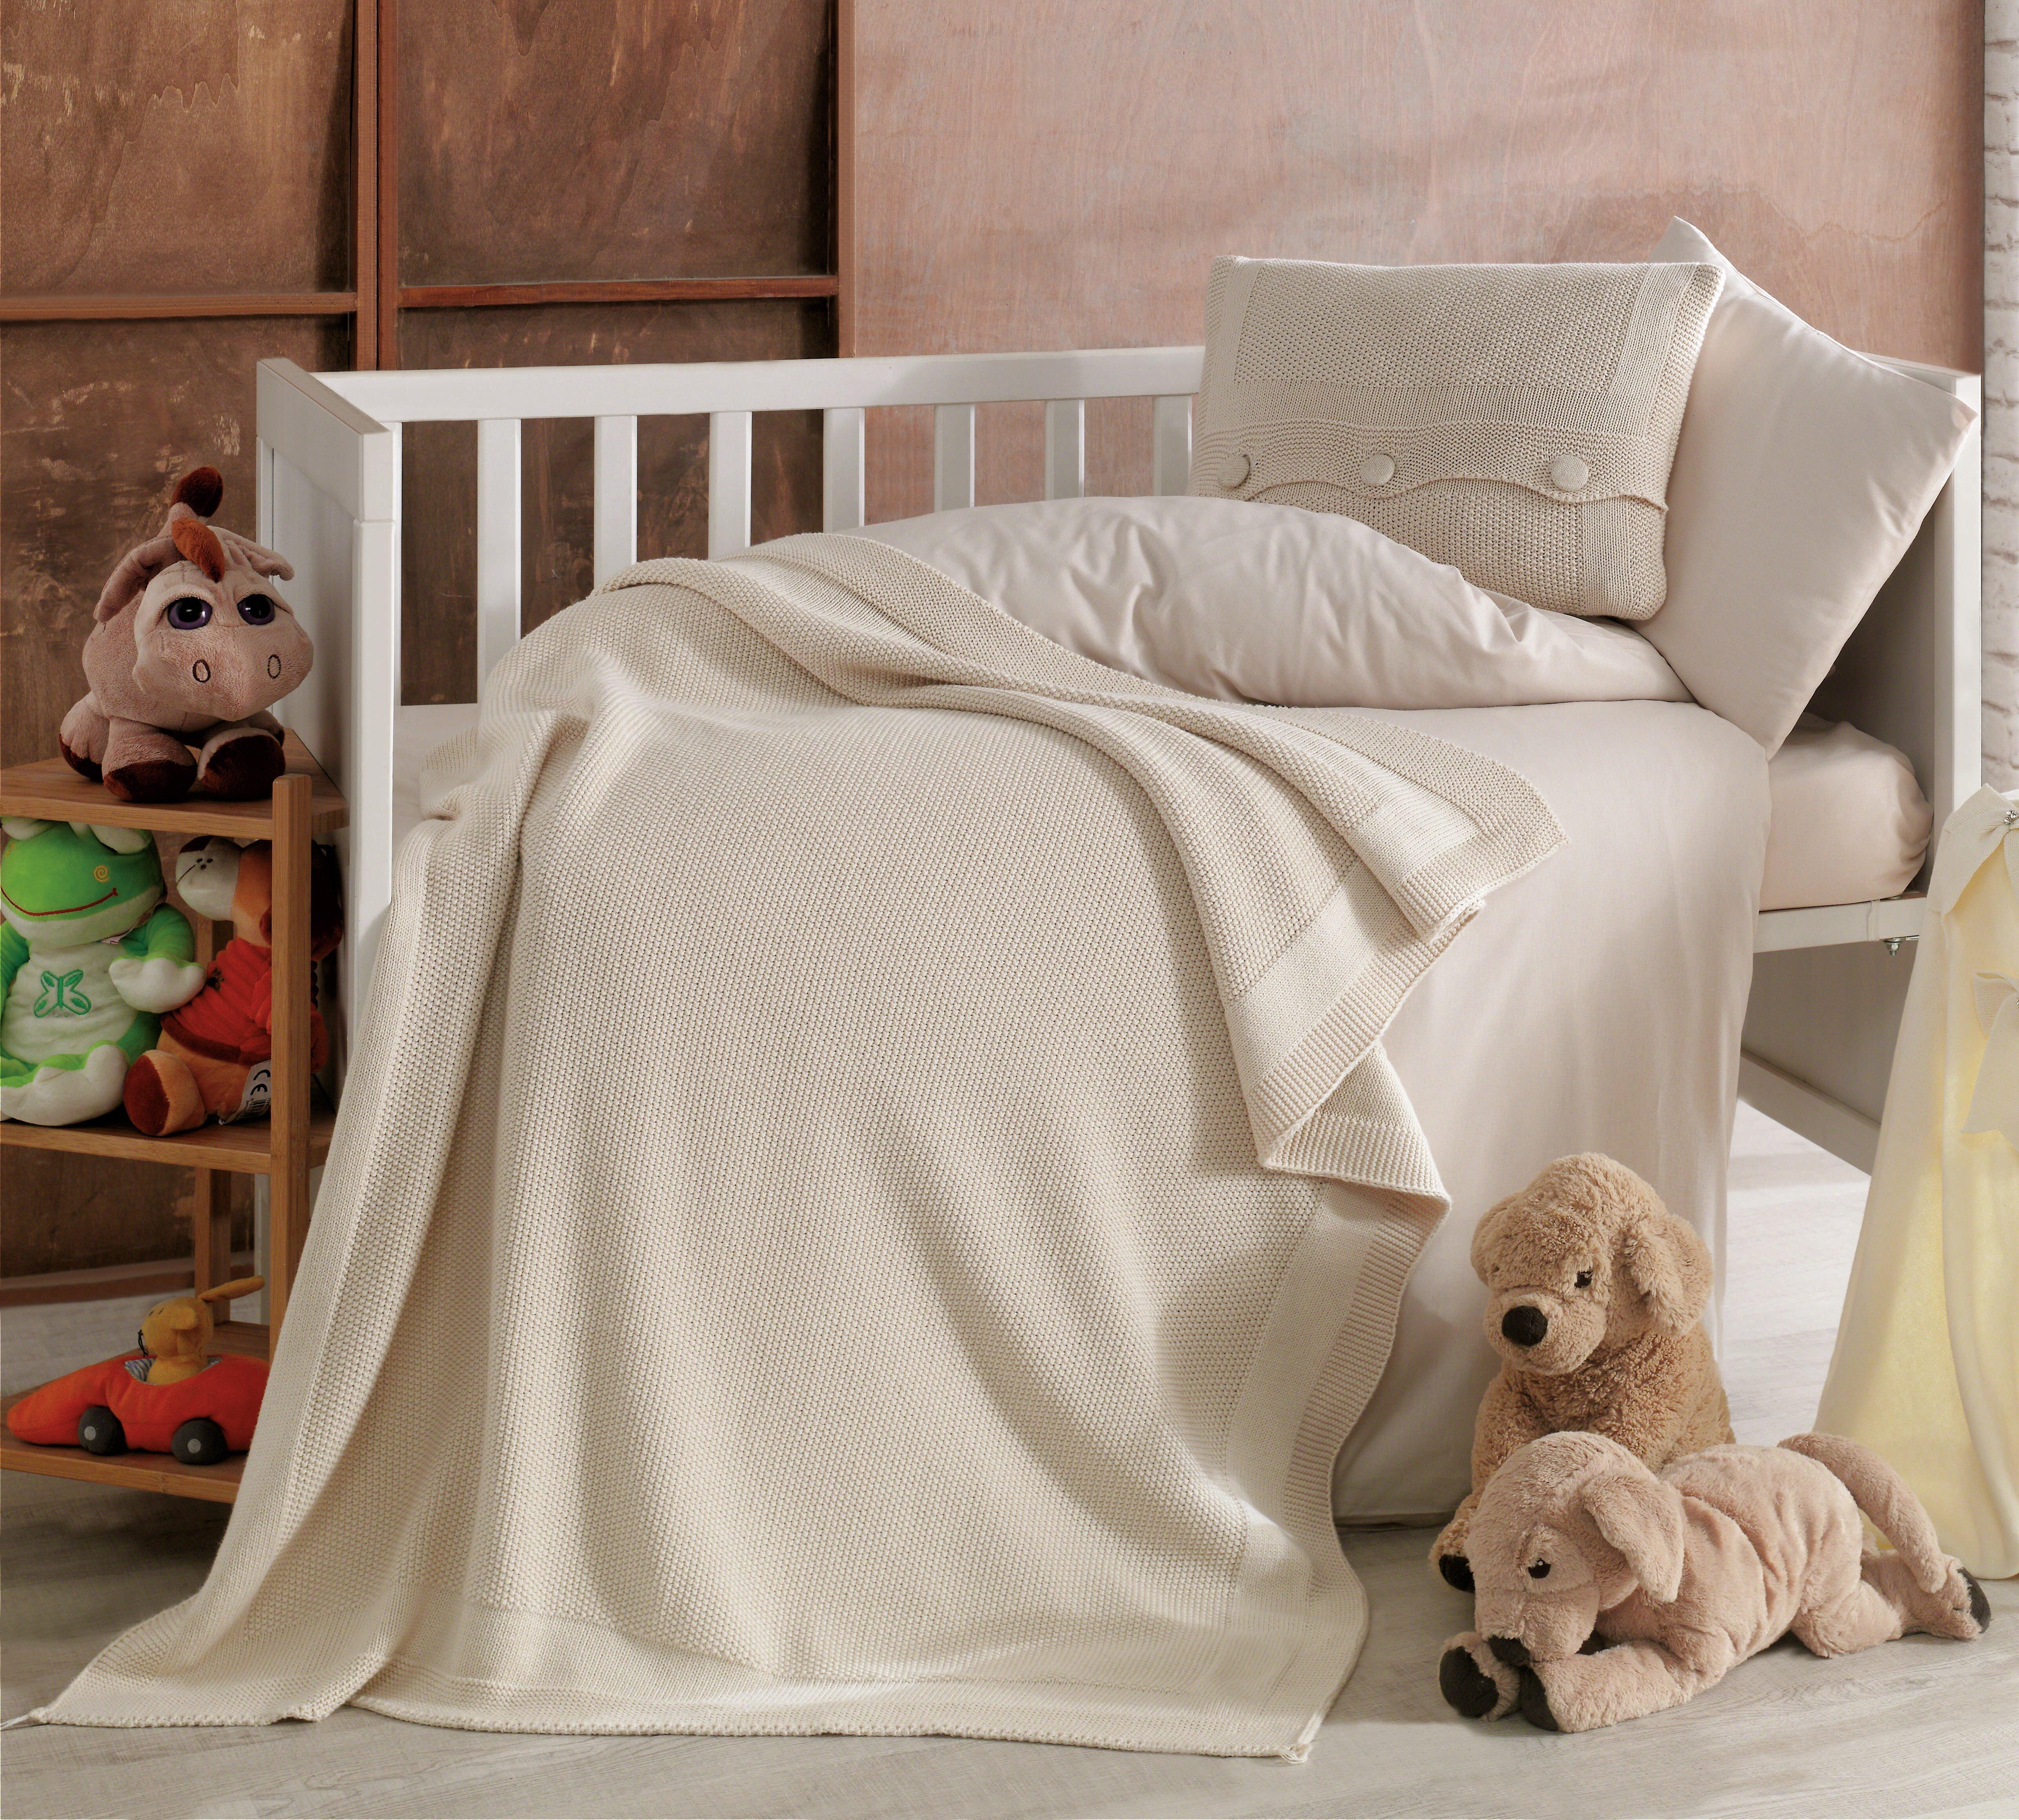 cb6187344367 Harriet Bee Dawna 6 Piece Crib Bedding Set